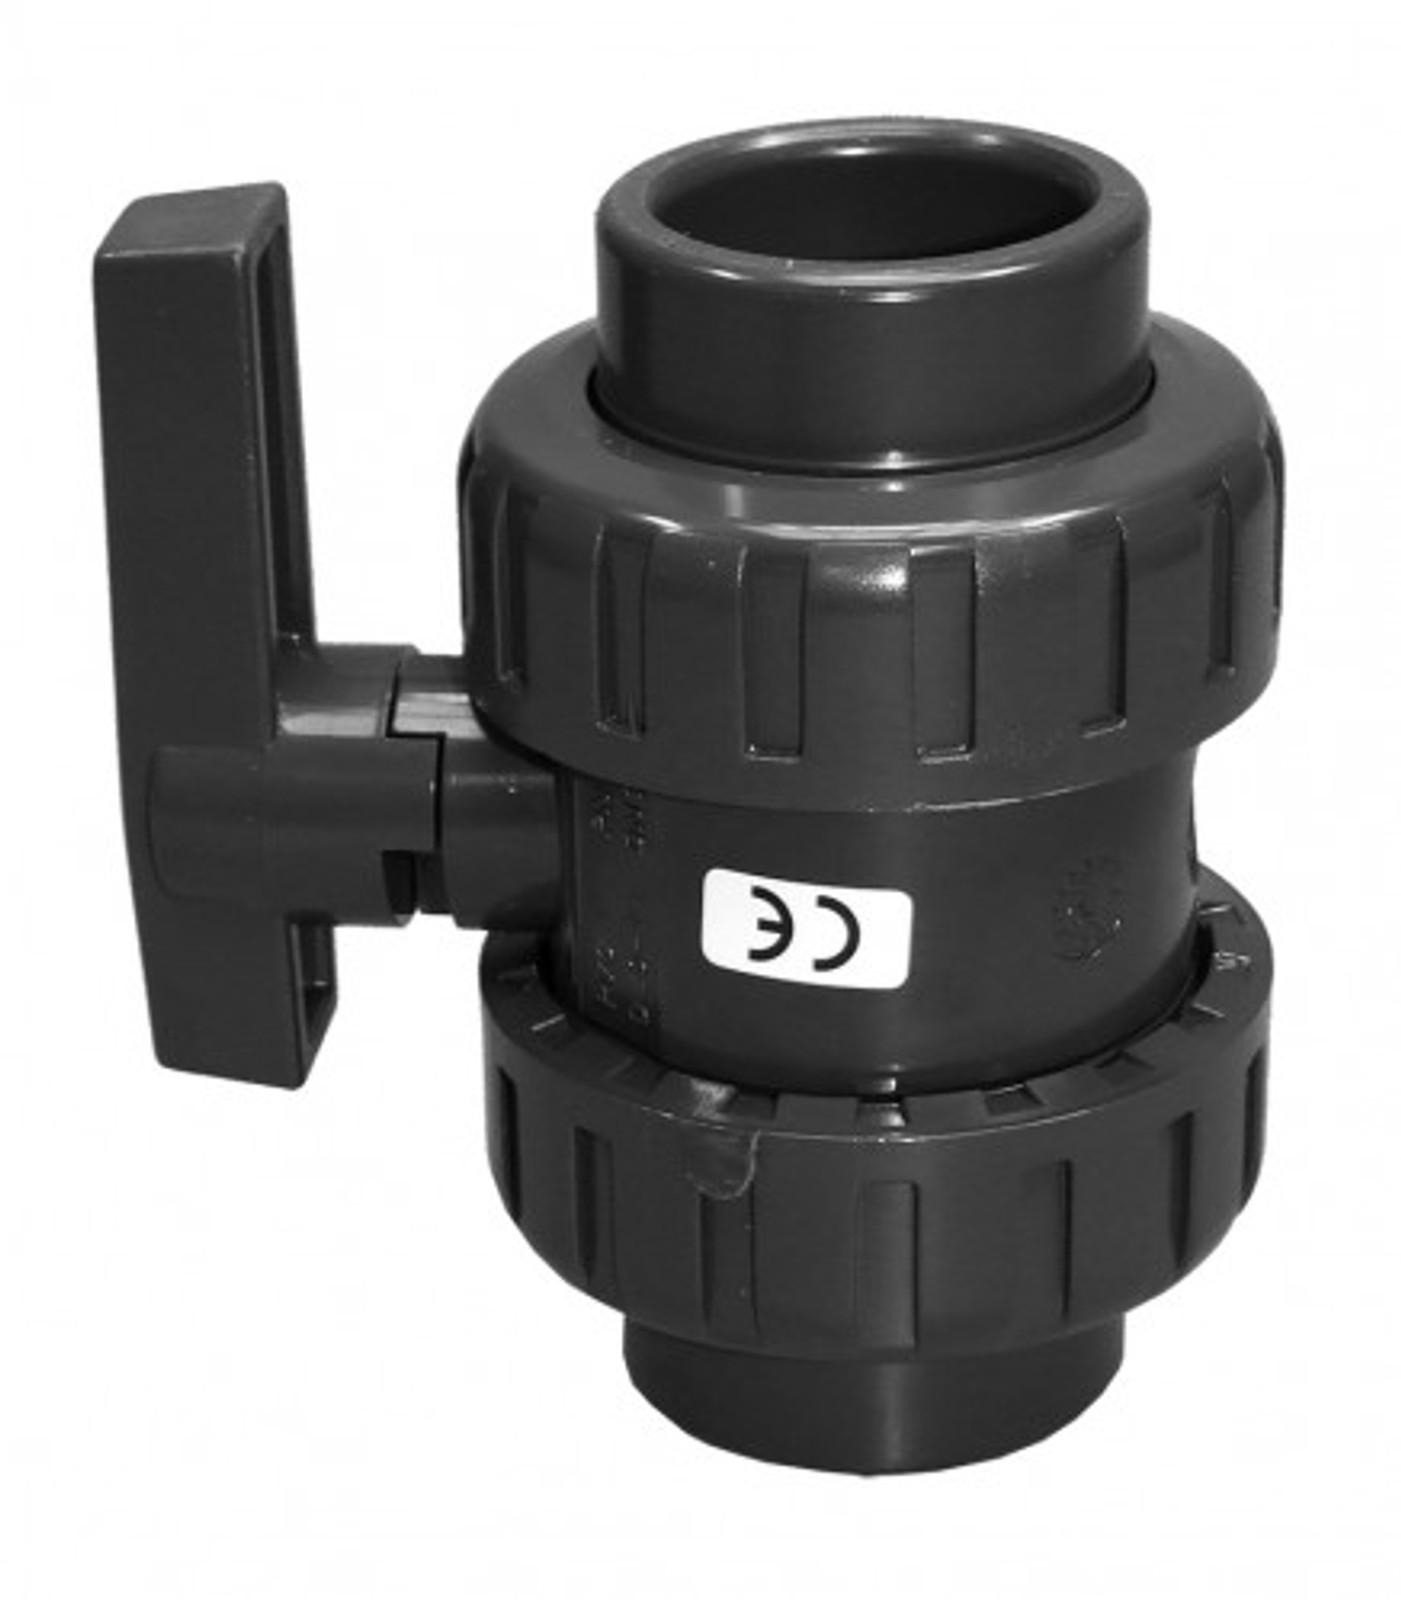 PVC-Kugelhahn m. 2 Anschlußenden, Ø 90 mm